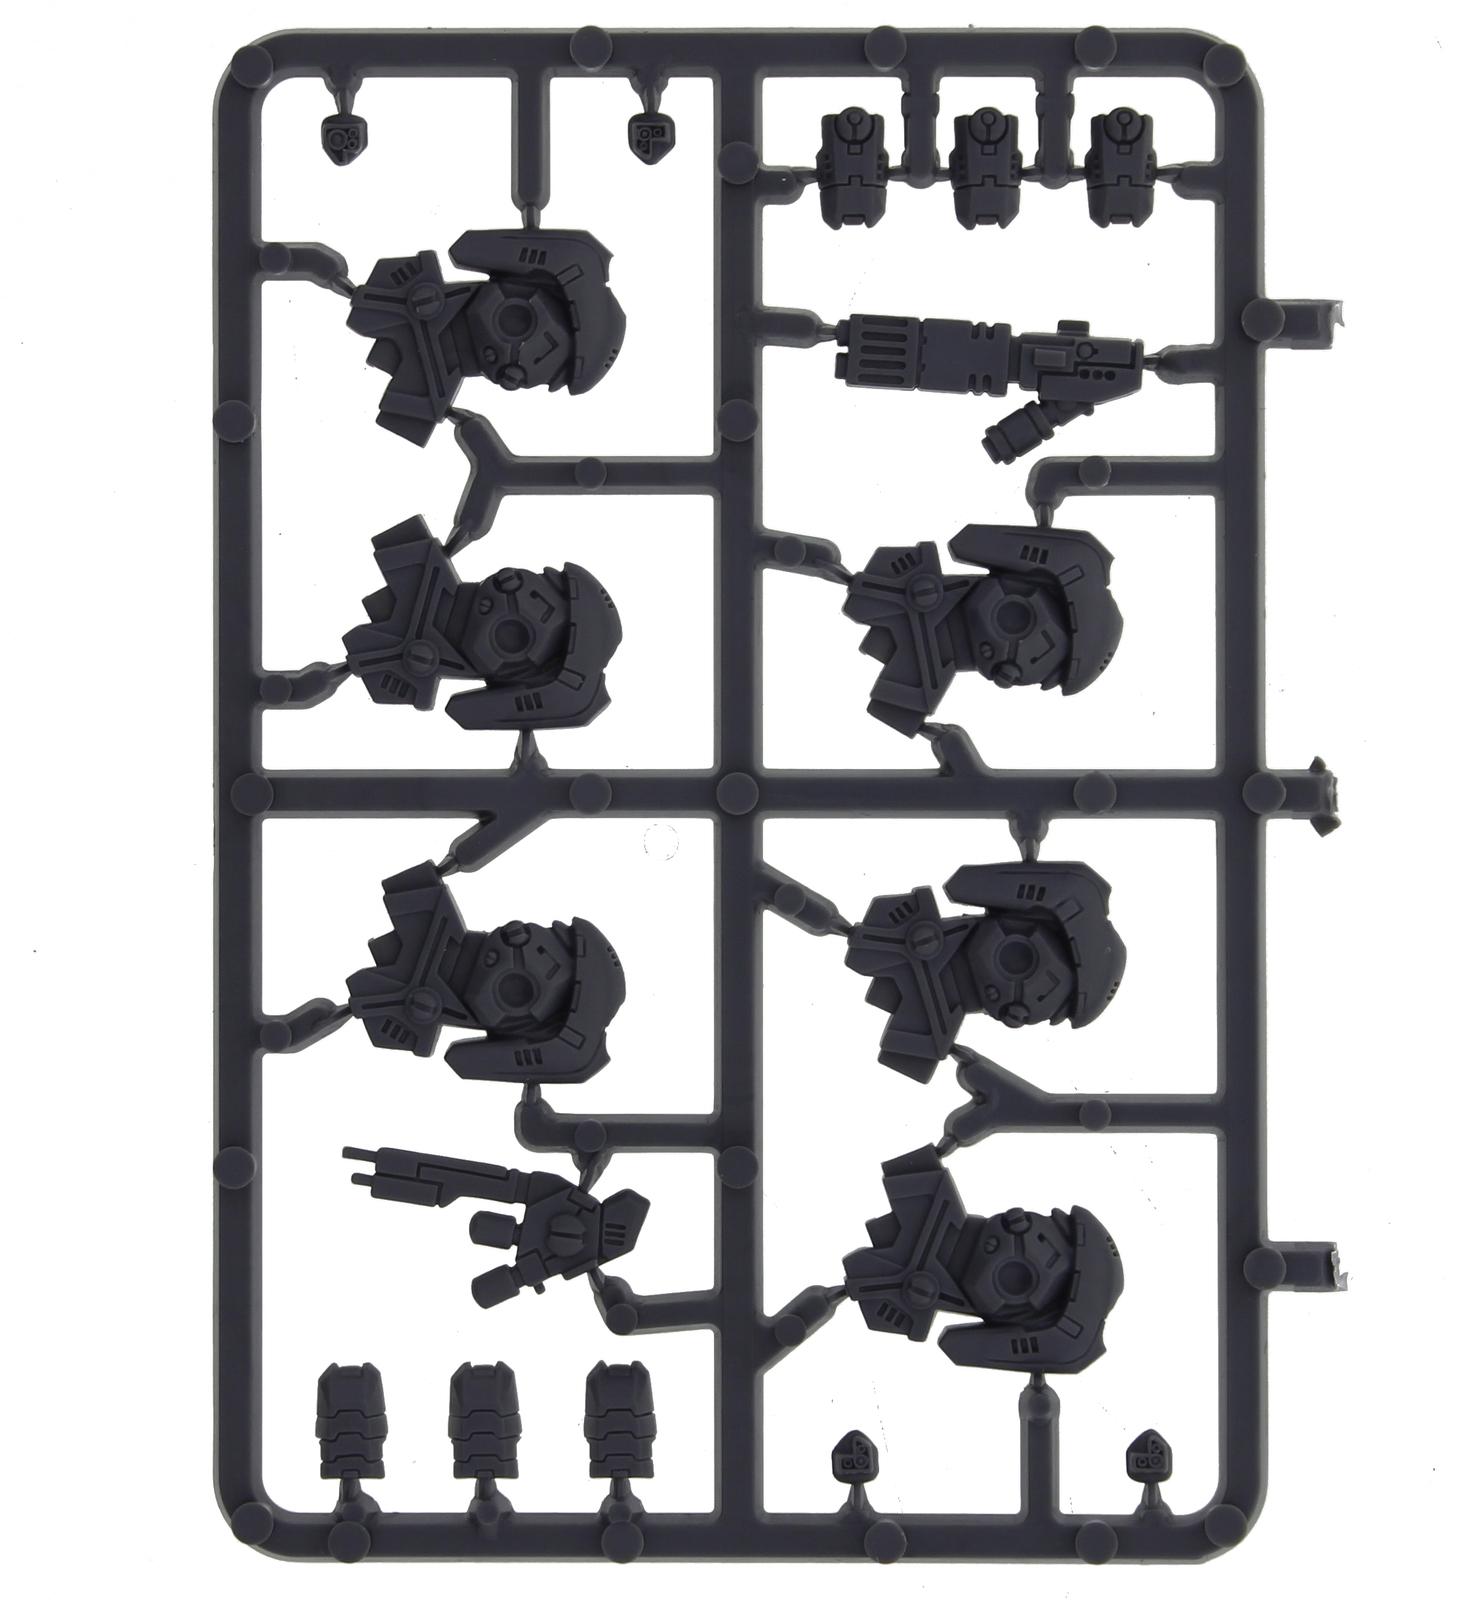 Warhammer 40,000 Tau XV25 Stealth Battlesuits image